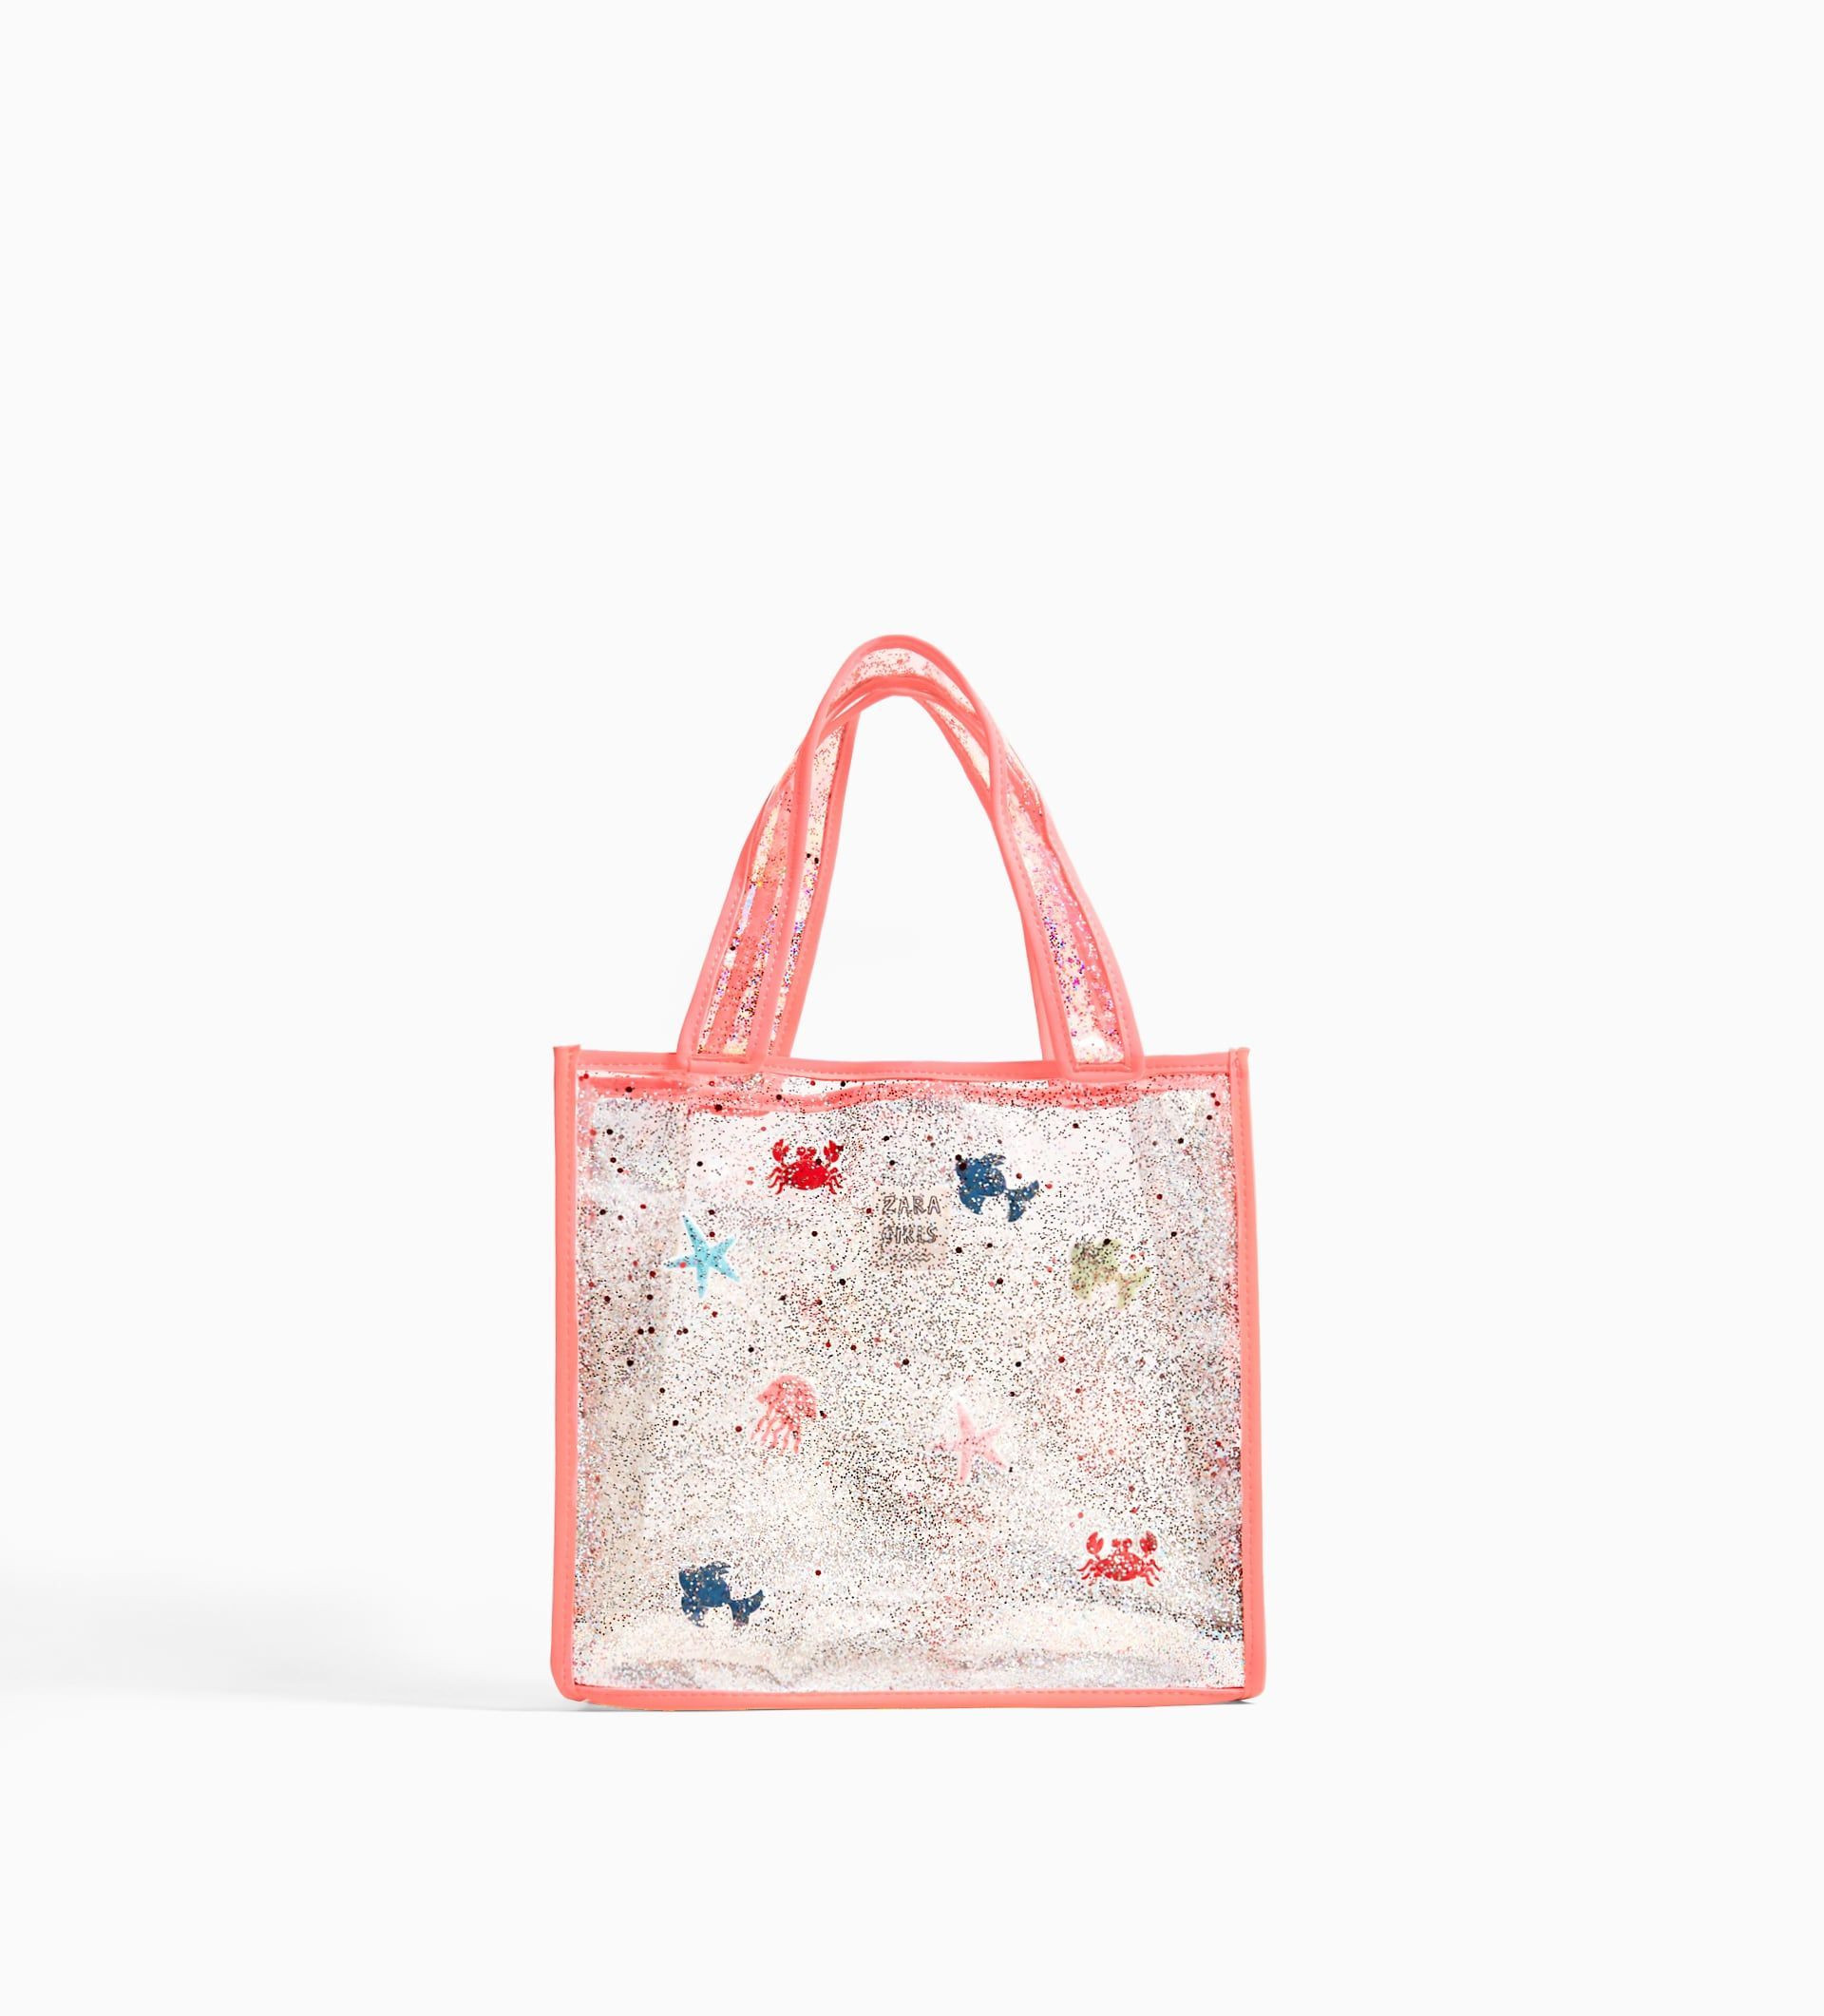 Vinyl Tote Bag From Zara Soft Leather Bag Girls Bags Kids Bags